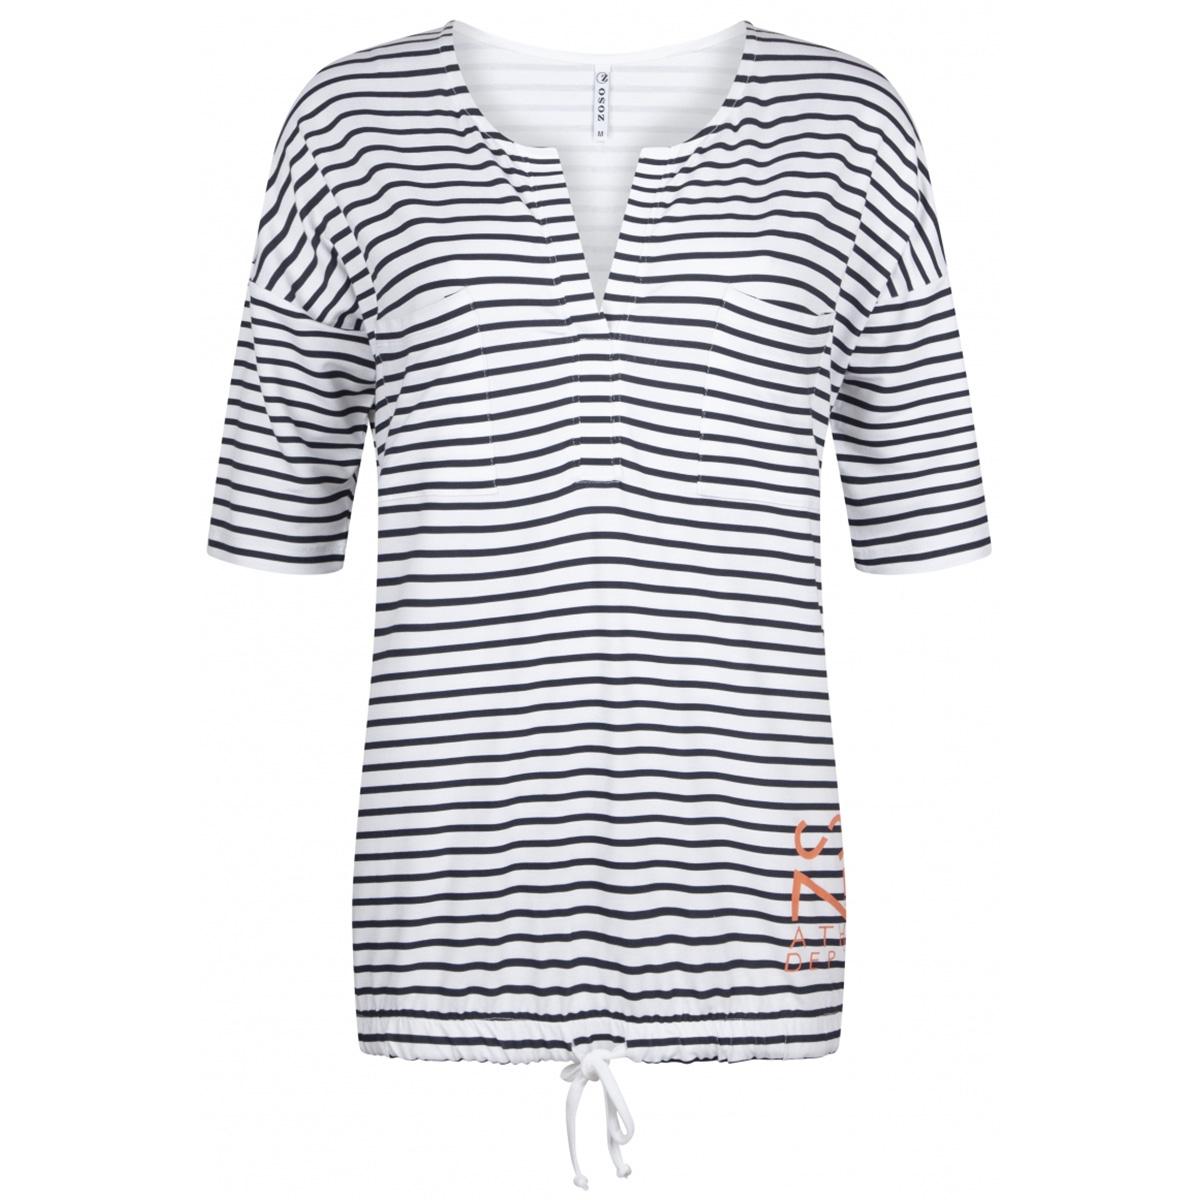 aivy striped blouse 192 zoso t-shirt navy/salmon